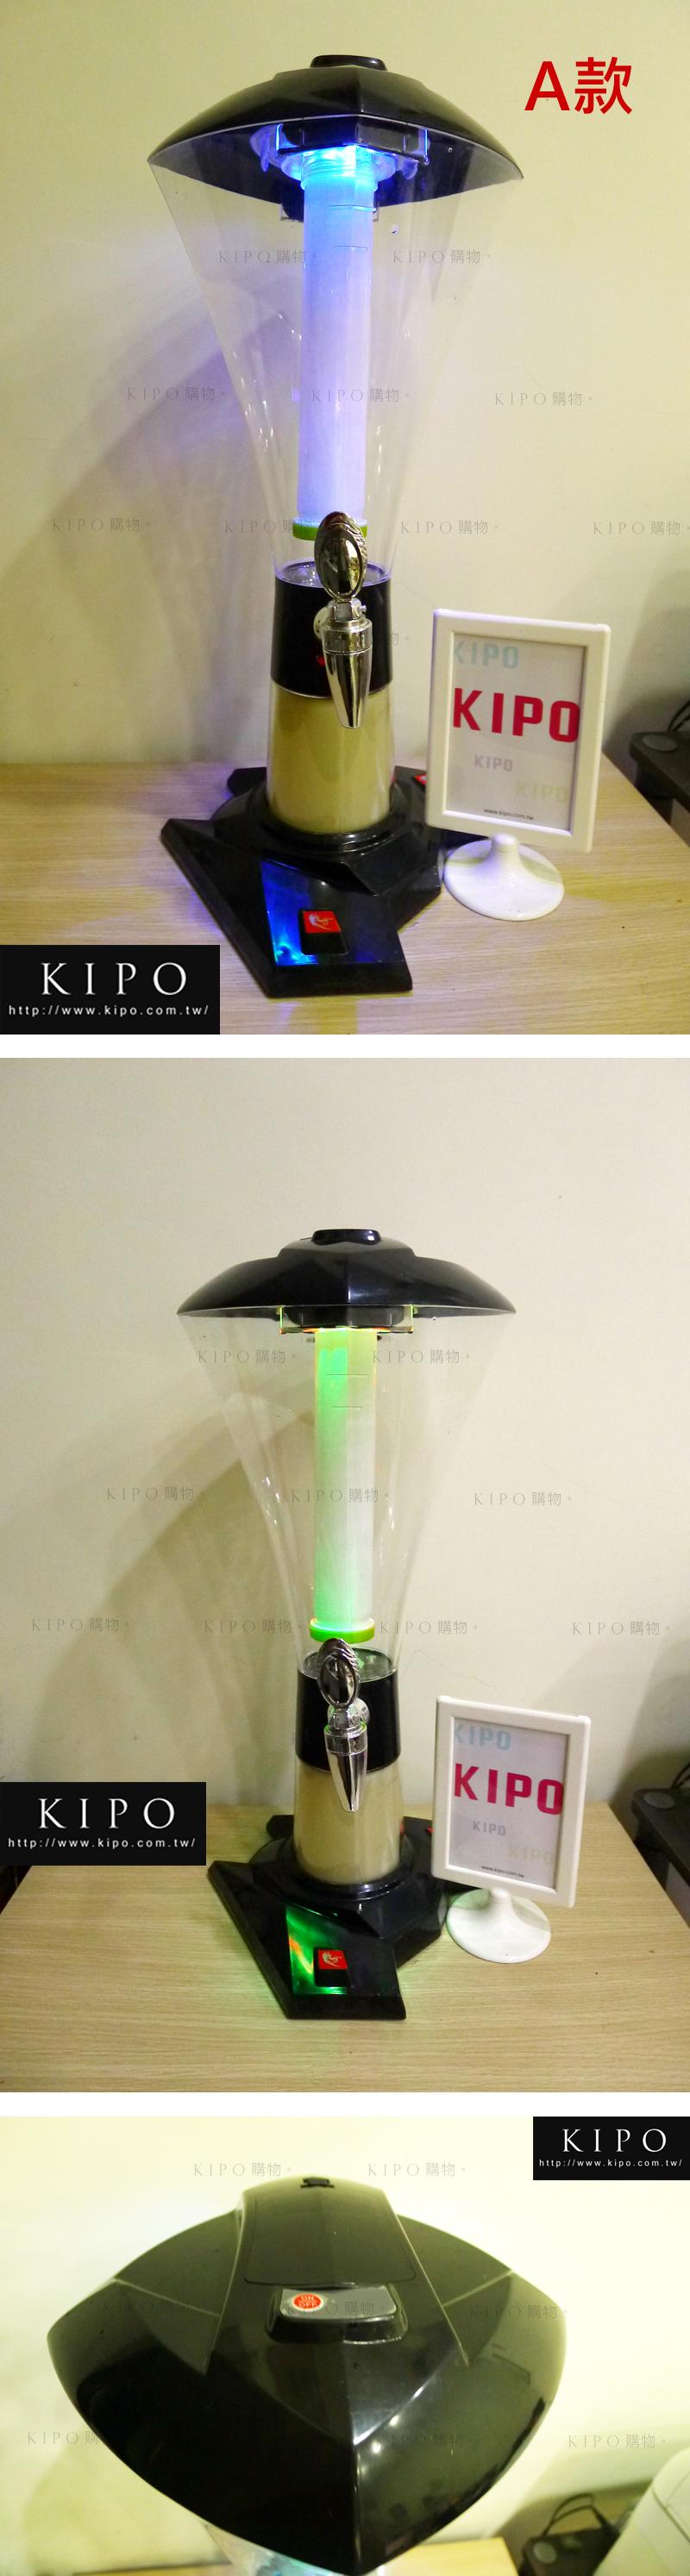 http://www.kipo.com.tw/EDM/buyimage/NEA006101A/p2.jpg